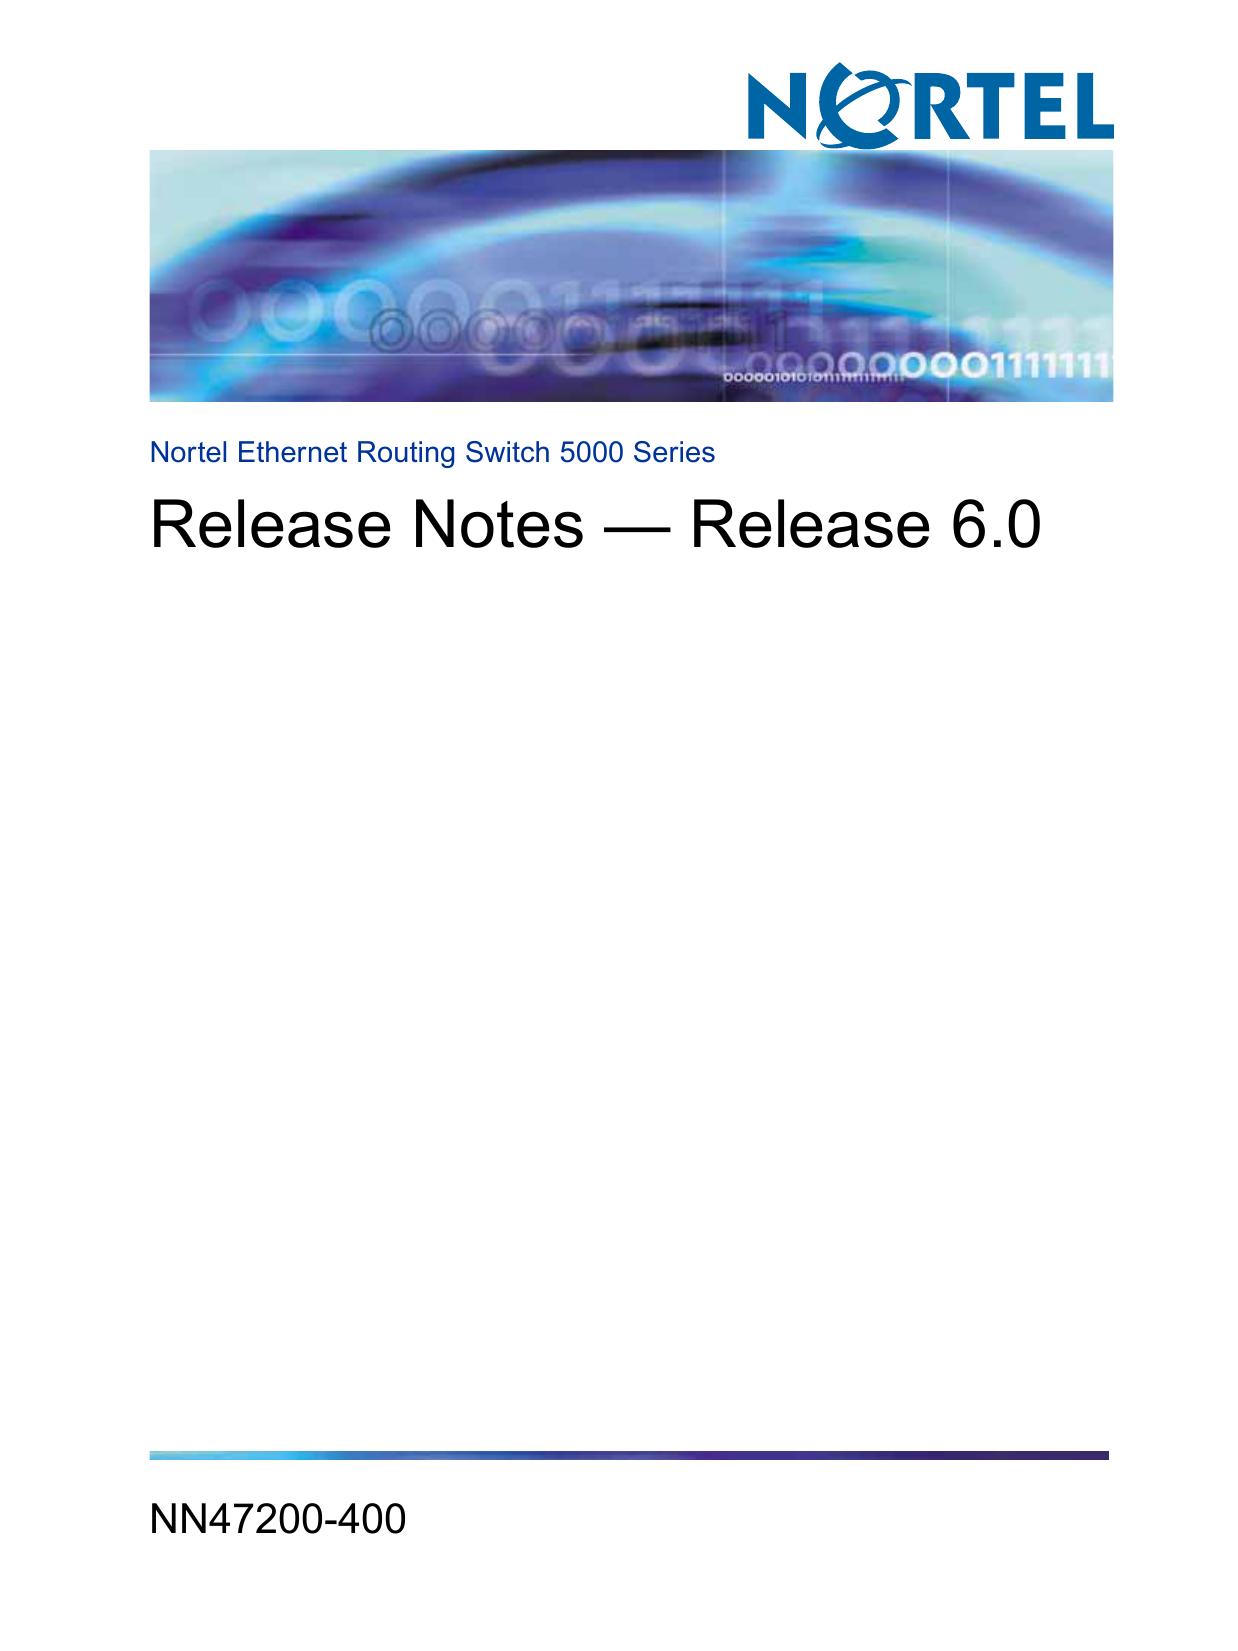 Release Notes — Release 6 0 - Nortel/Avaya Baystack Edge